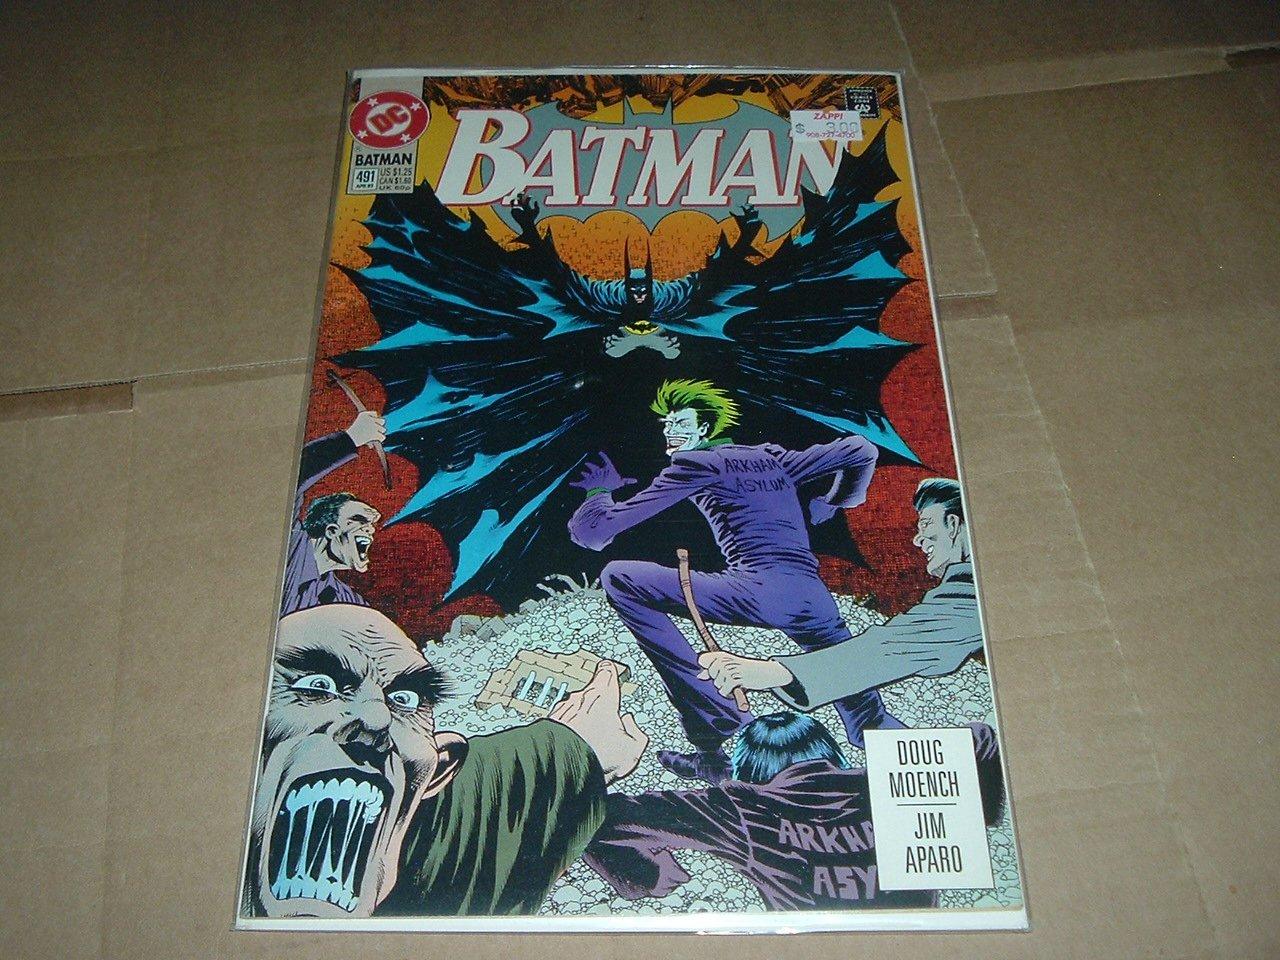 Batman #491 Bane frees Arkham Ayslum inmates VERY FINE (DC Comics 1993) Save $$ Shipping Special